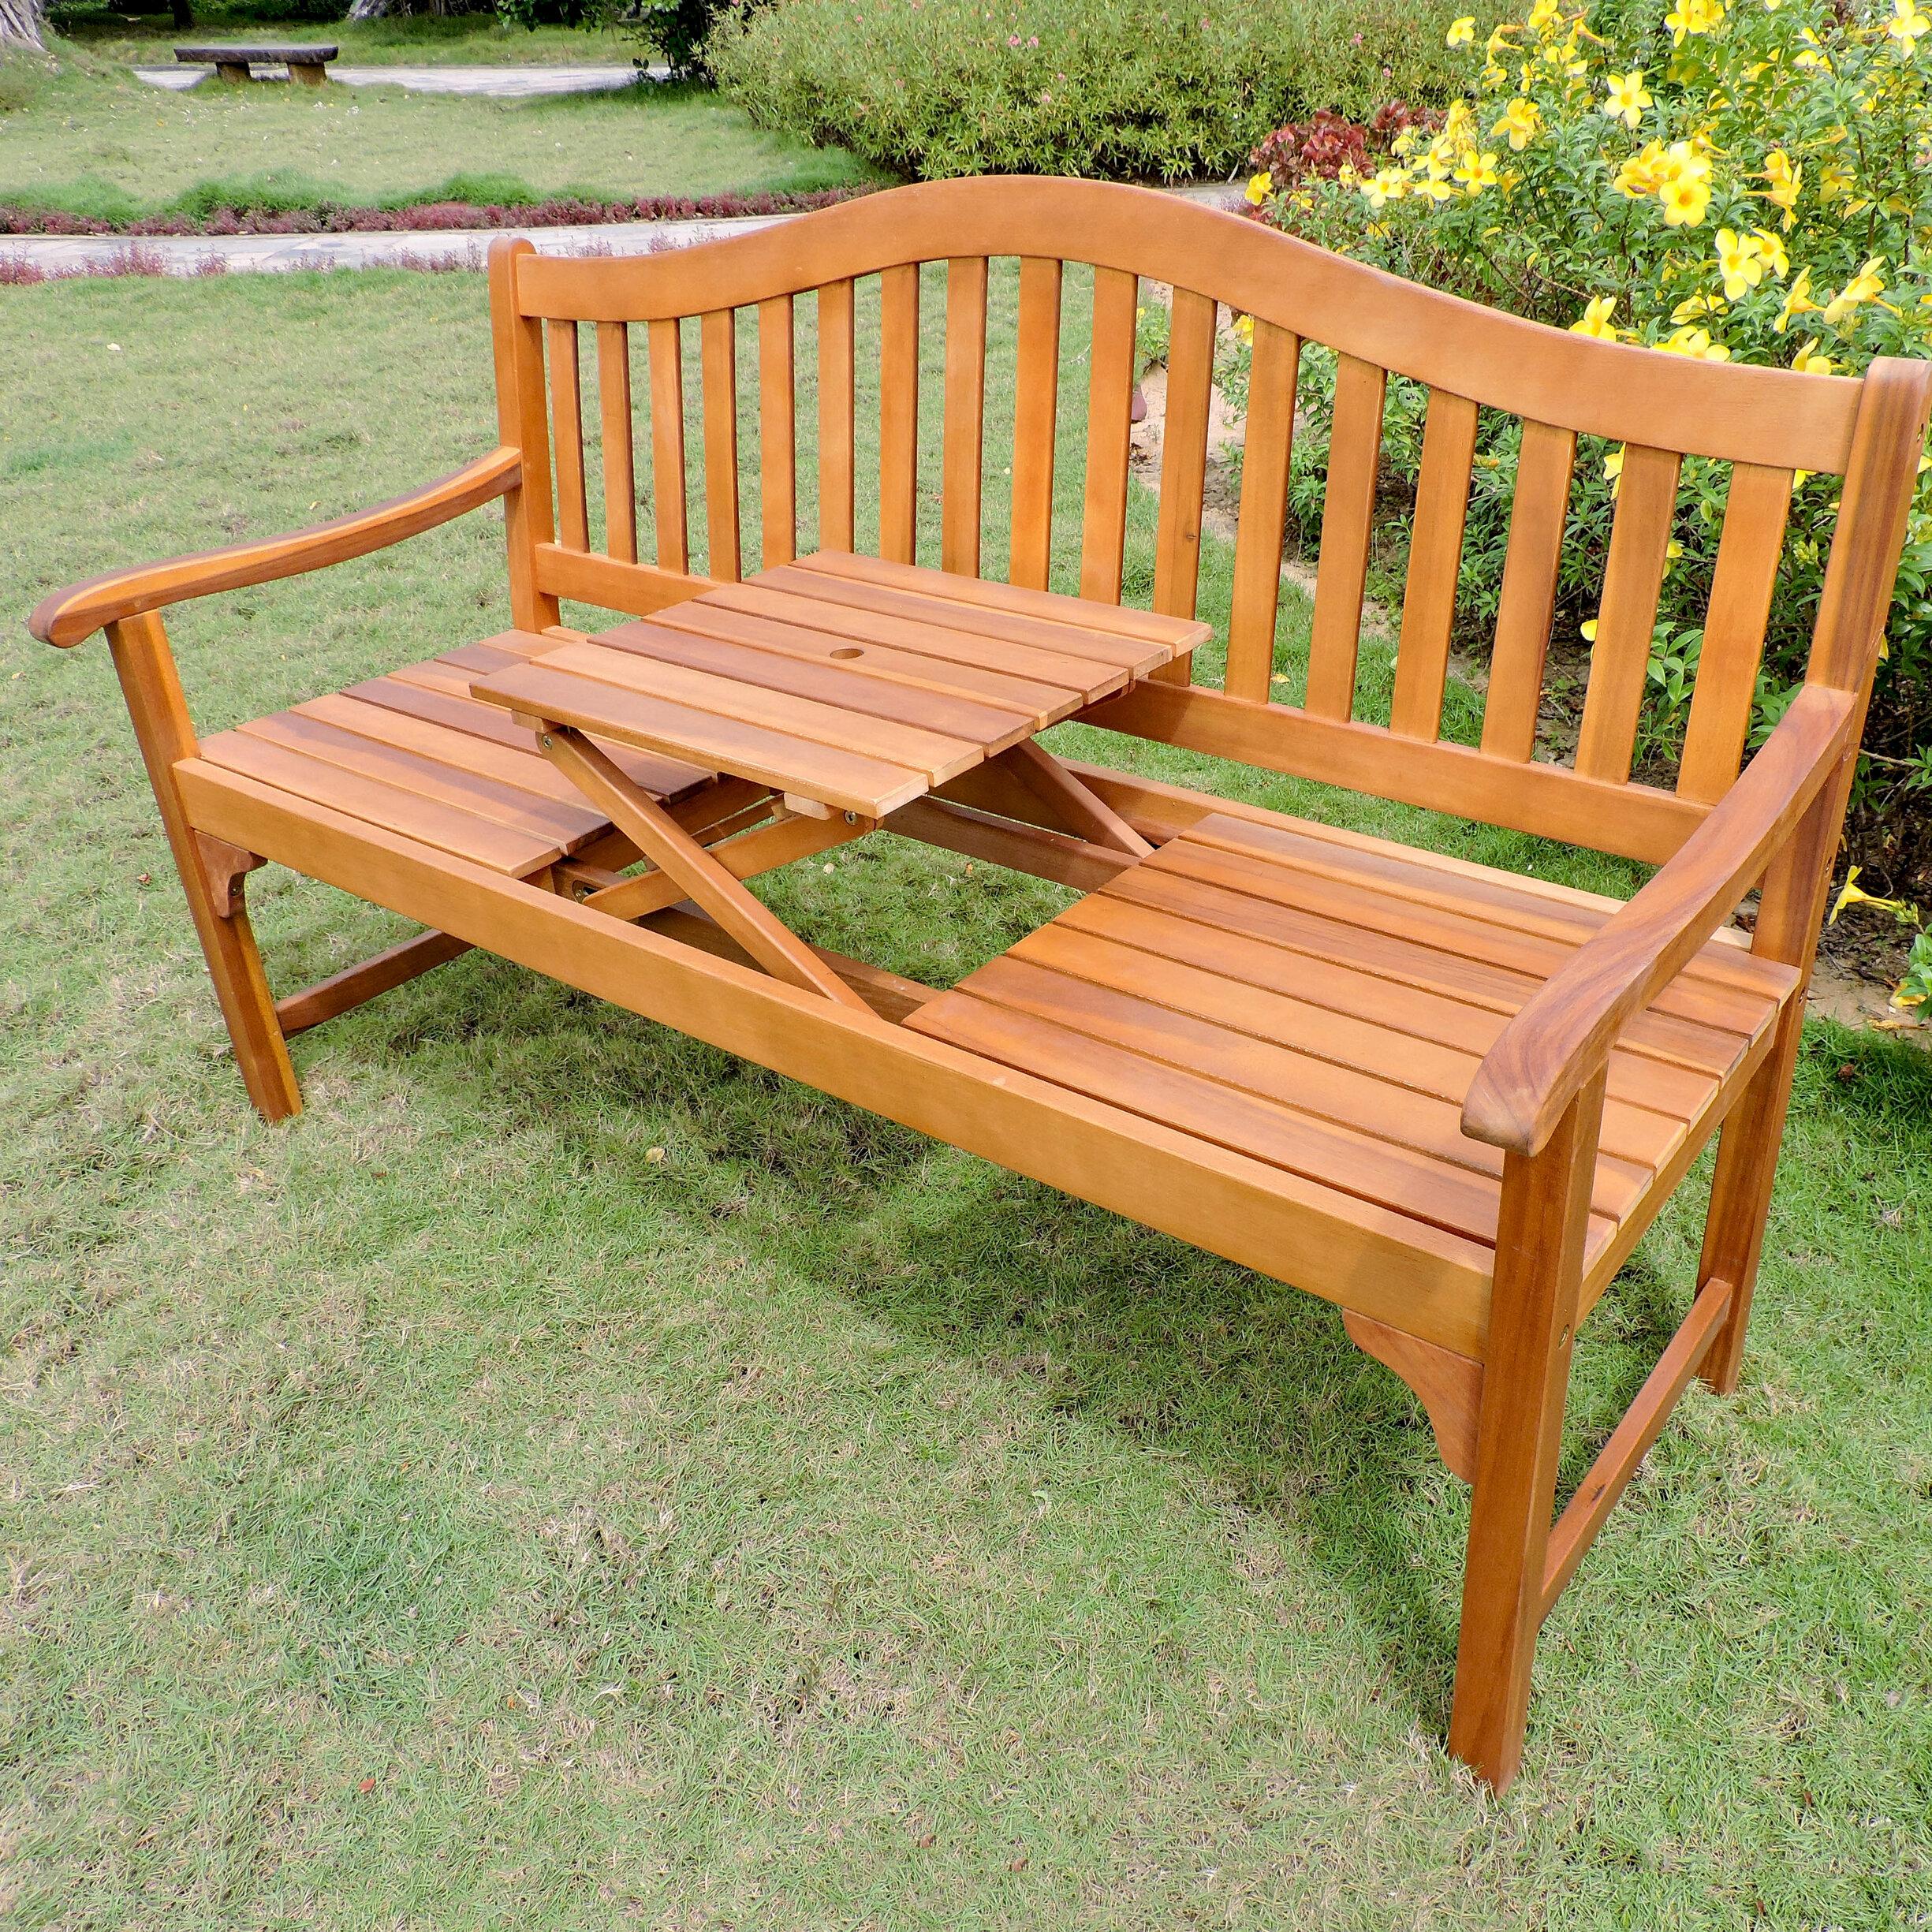 Leone Wooden Garden Bench With Regard To Manchester Wooden Garden Benches (View 10 of 25)